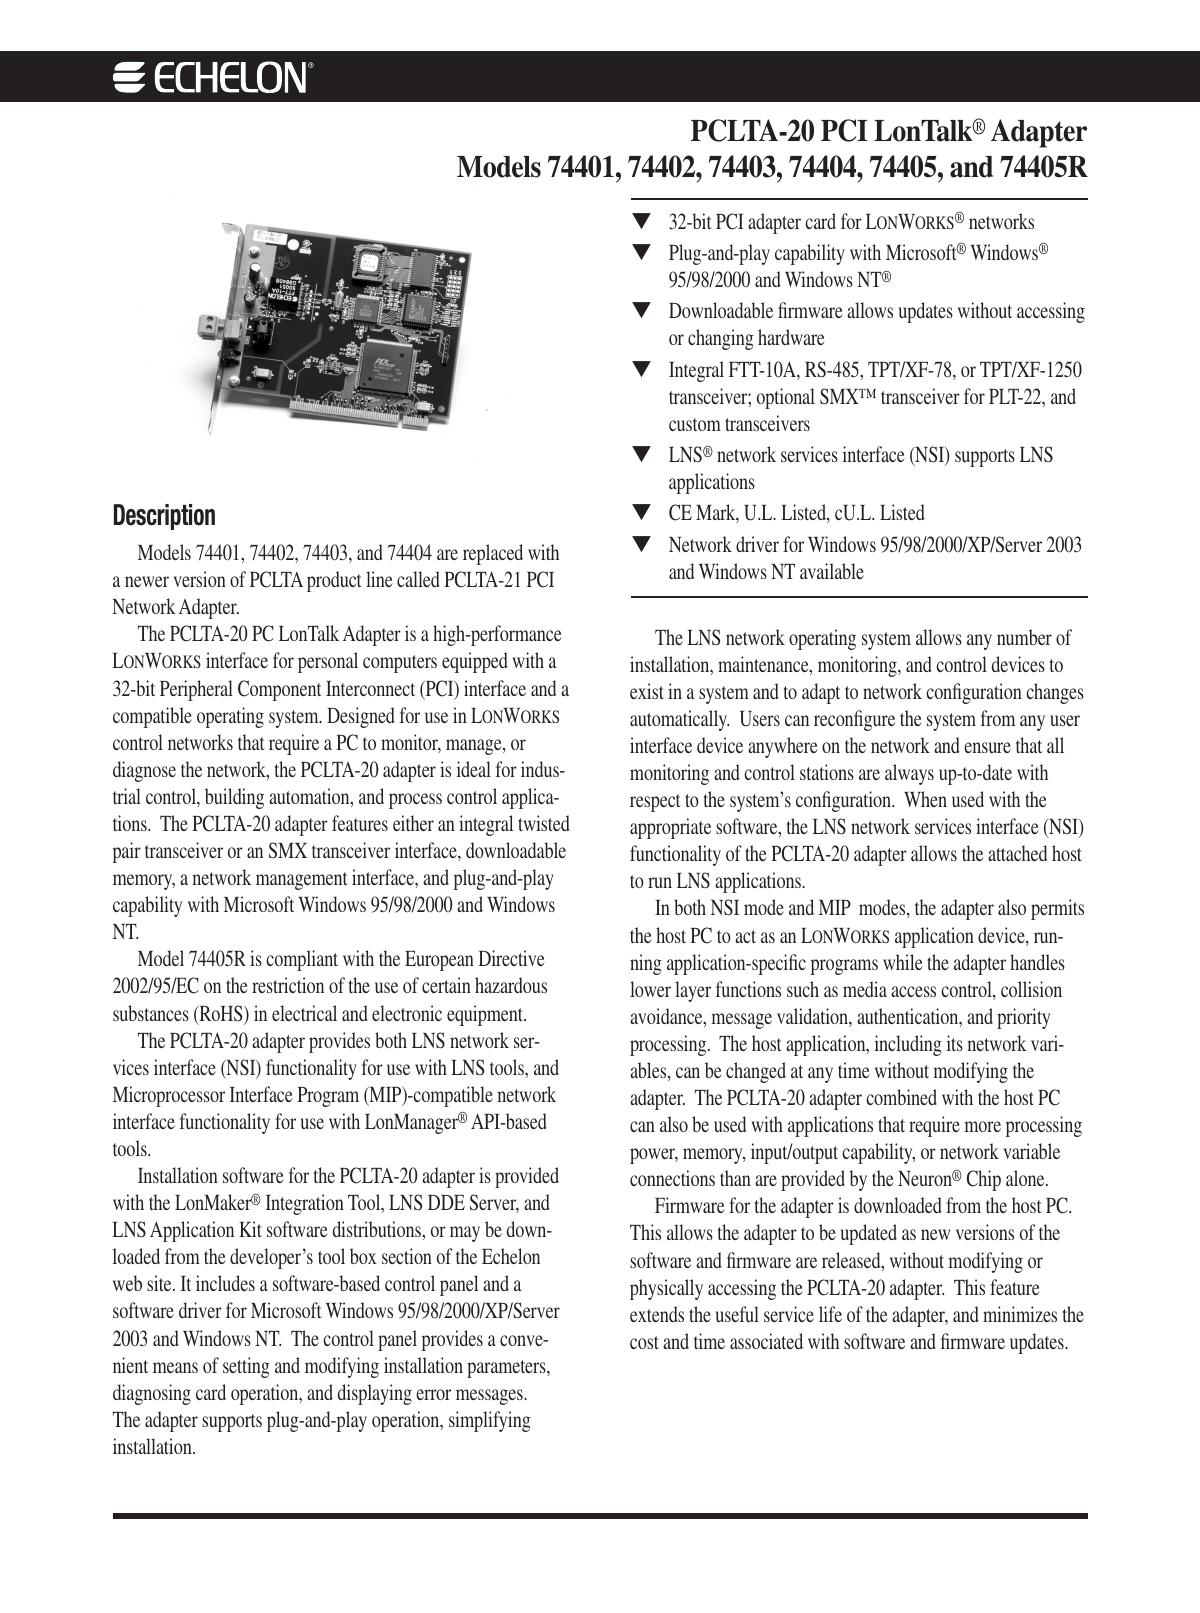 DRIVER UPDATE: ECHELON PCLTA-20